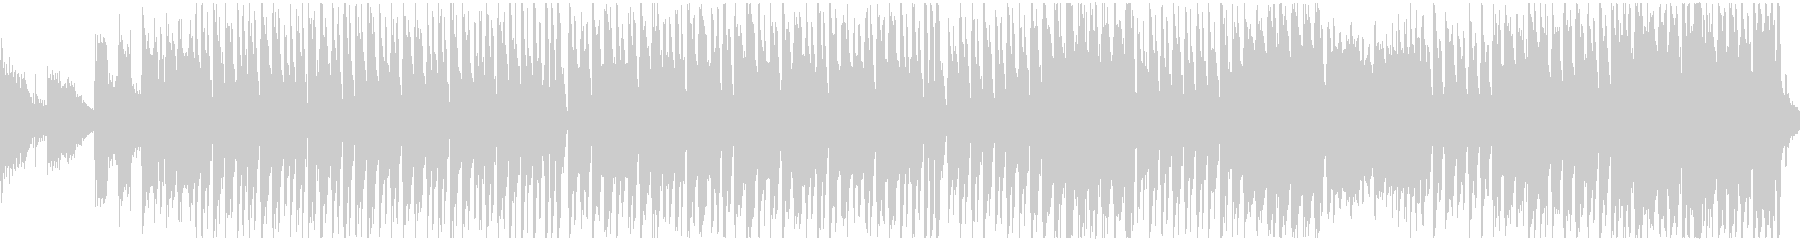 Pop Halloween song (loop)'s unreproduced waveform